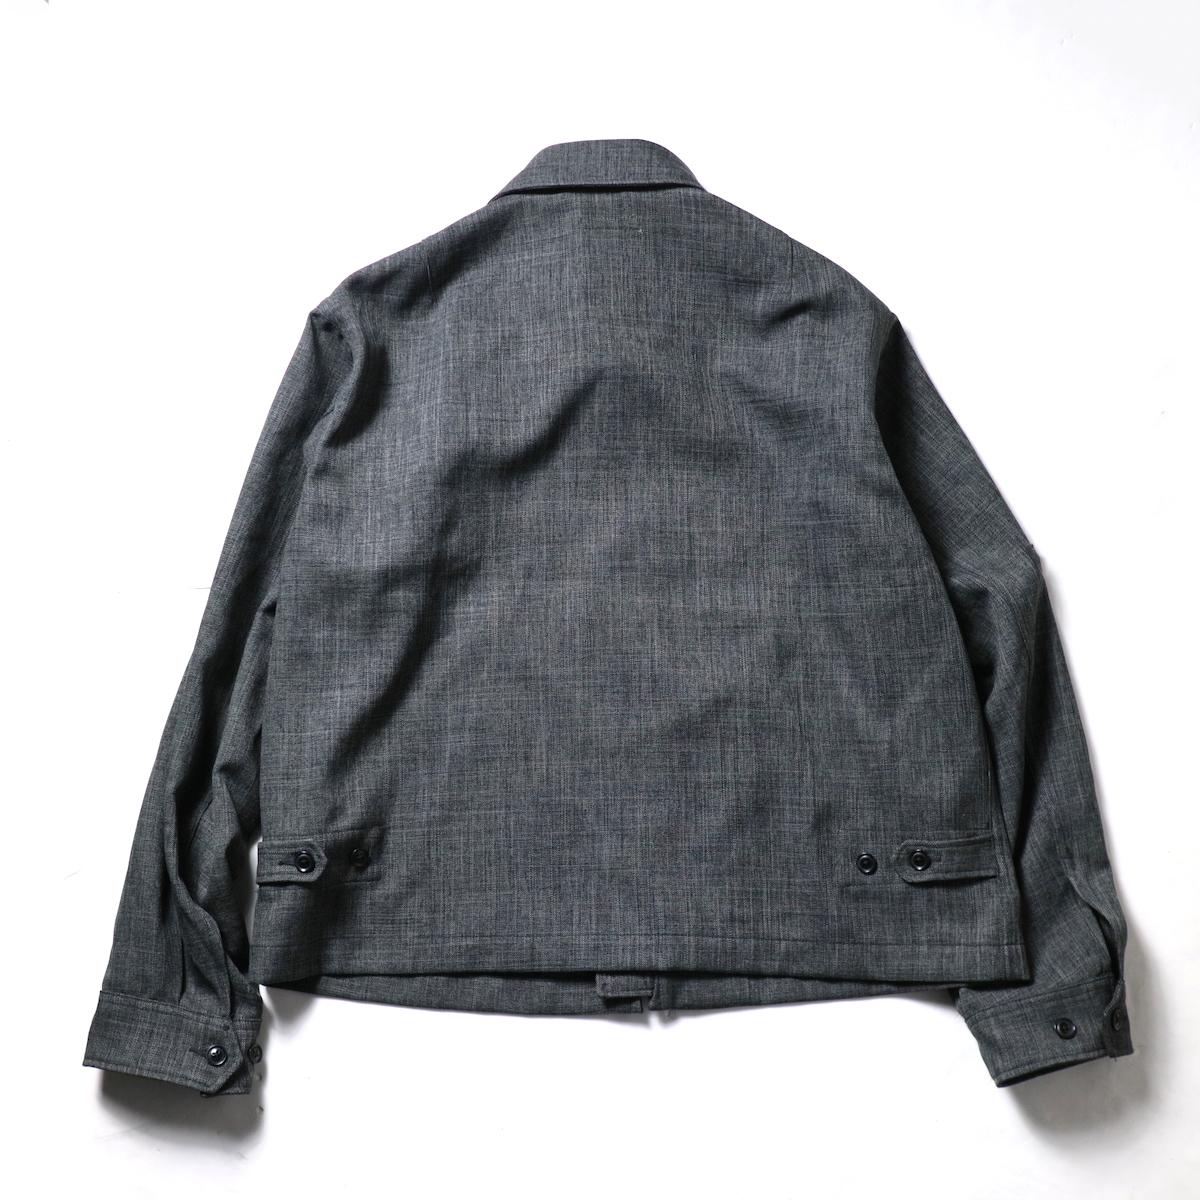 Engineered Garments / Claigton Jacket - Polyester Sharkskin (Charcoal)背面